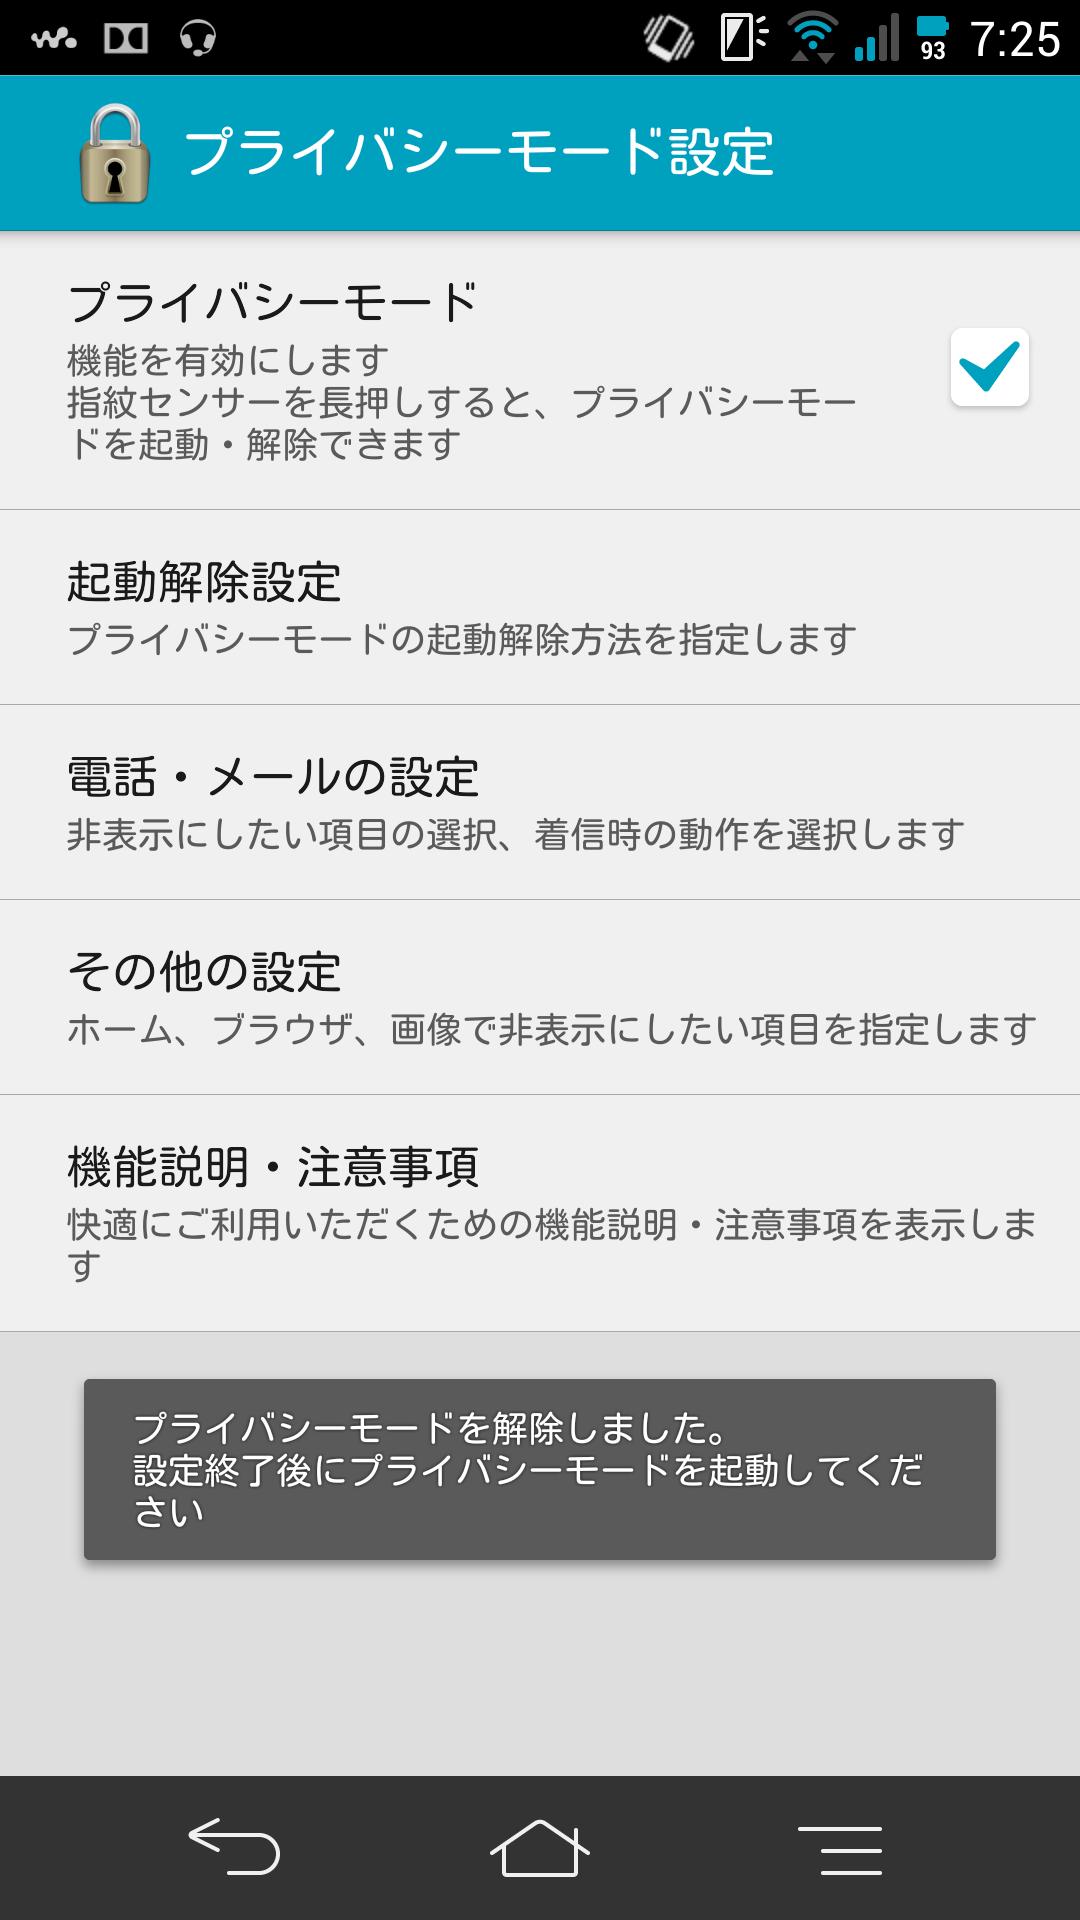 Screenshot_2014-08-14-07-25-14.png